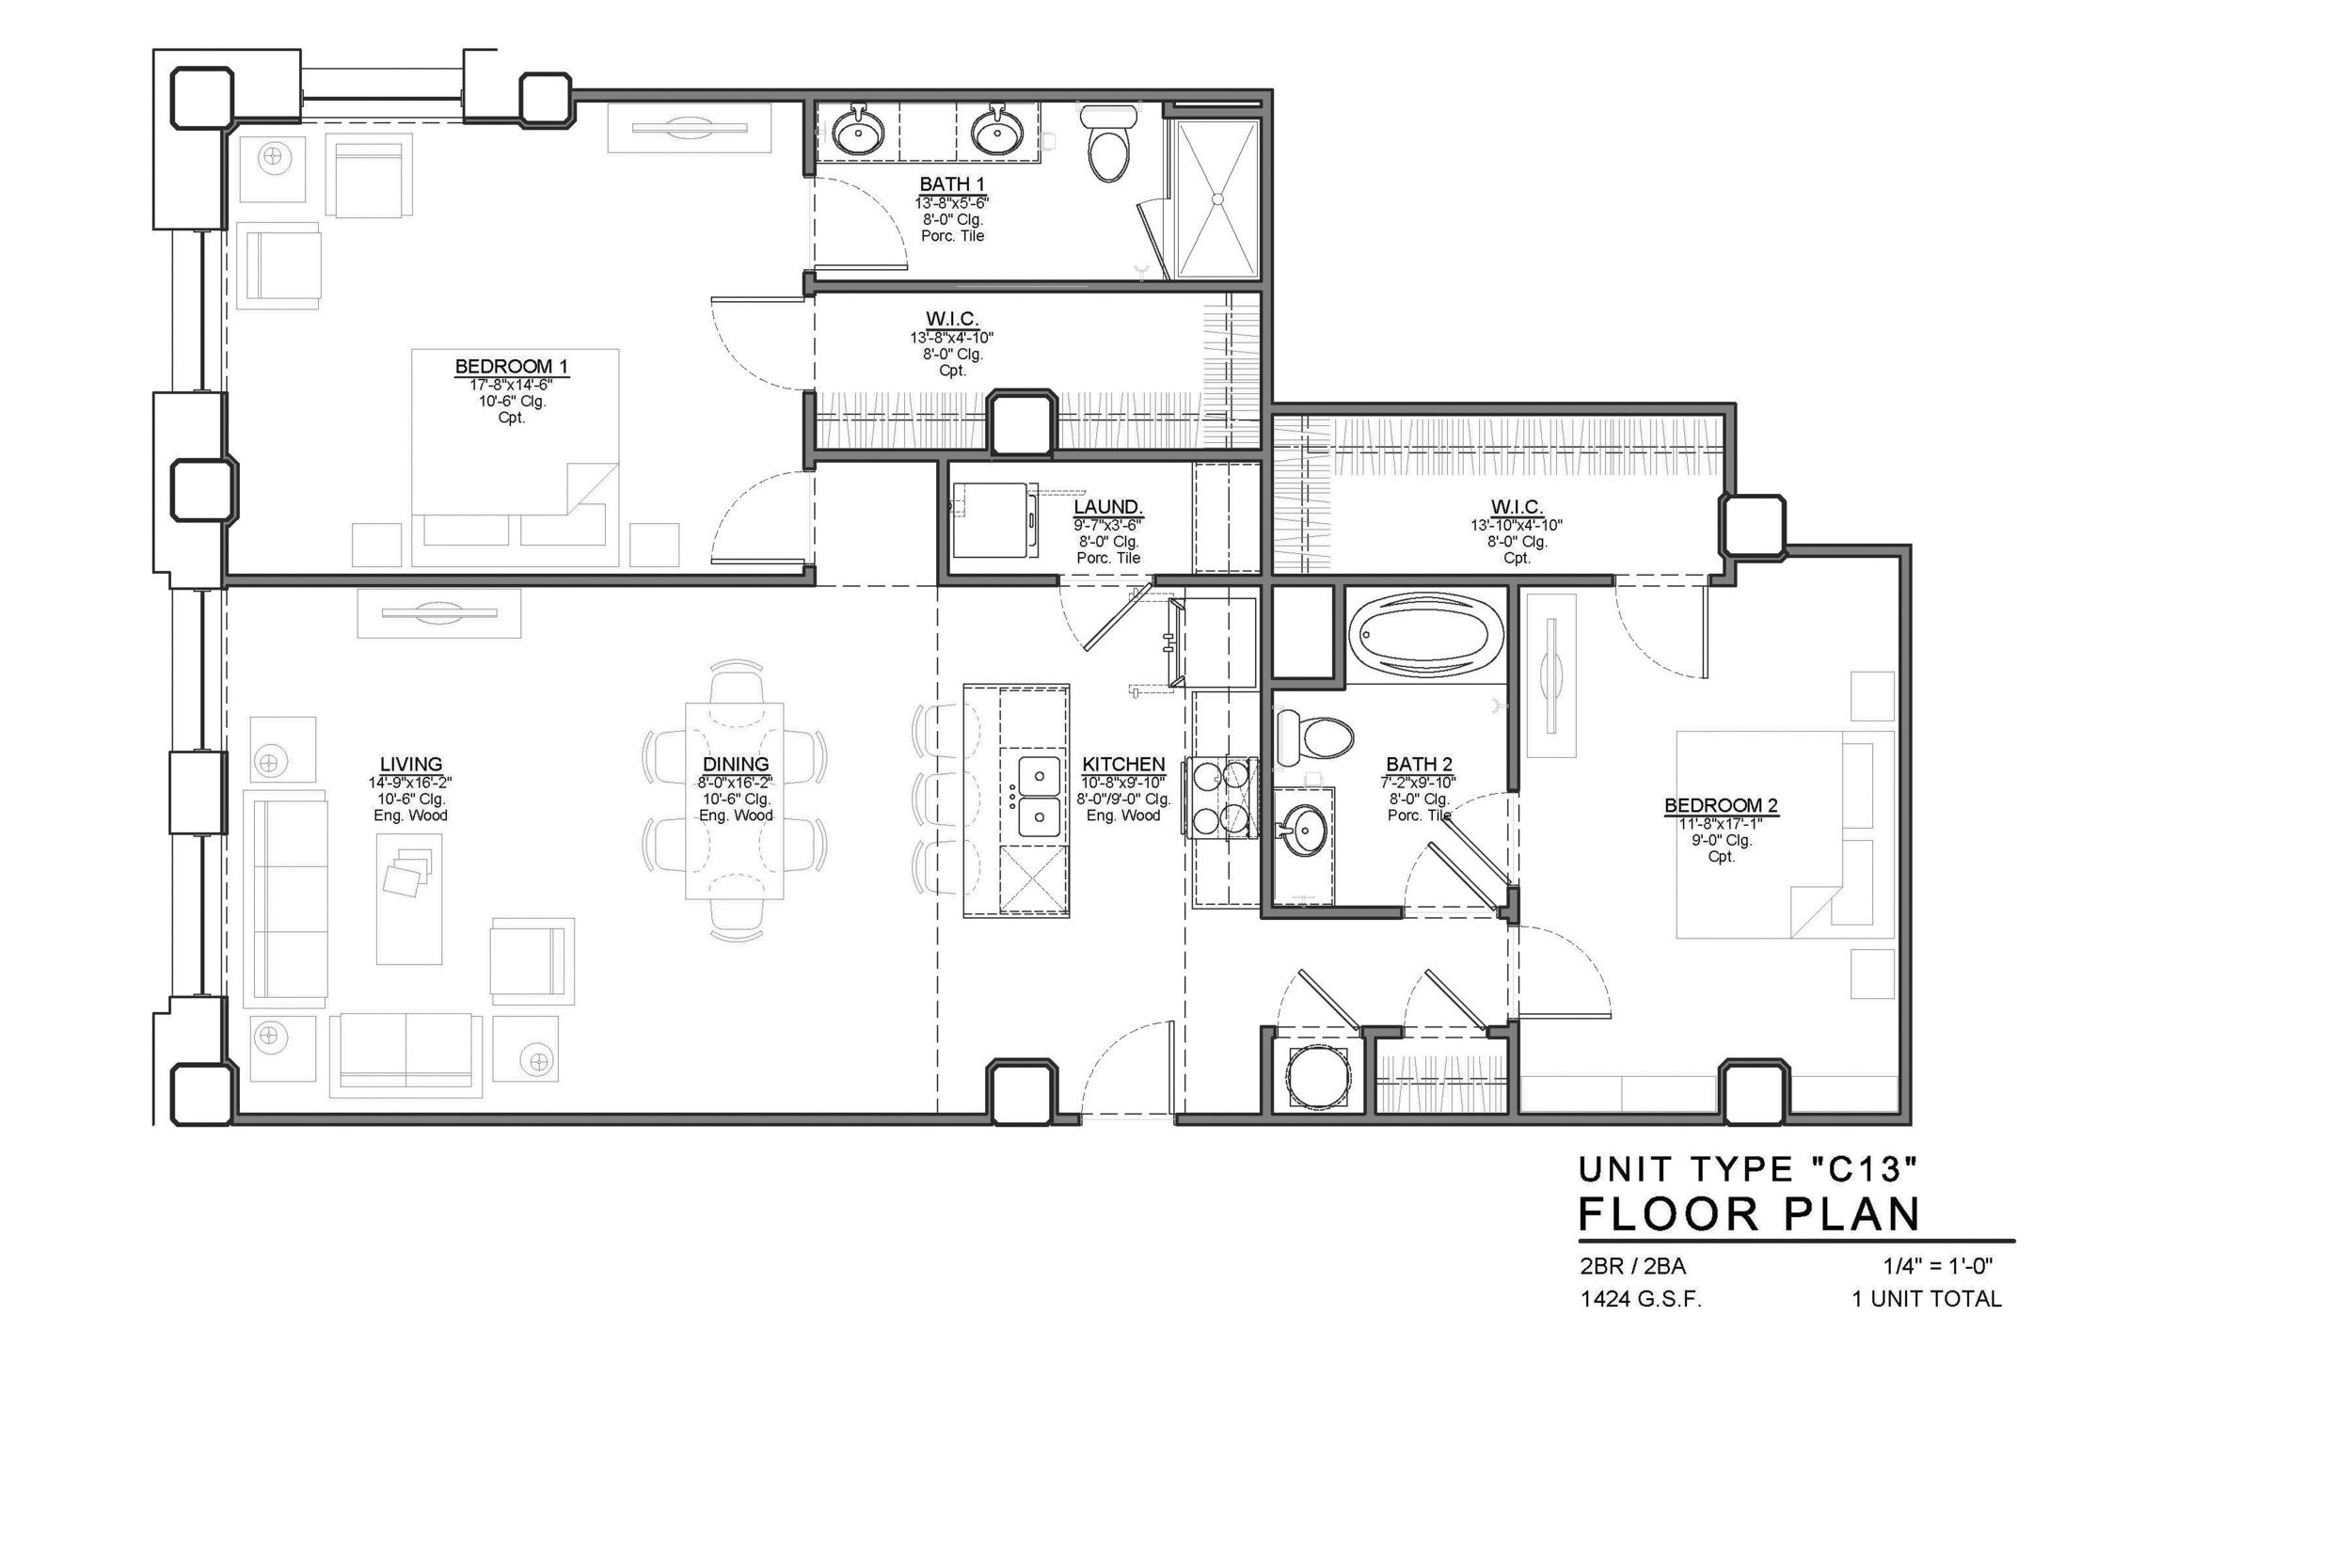 19th Floor Plans Gallery